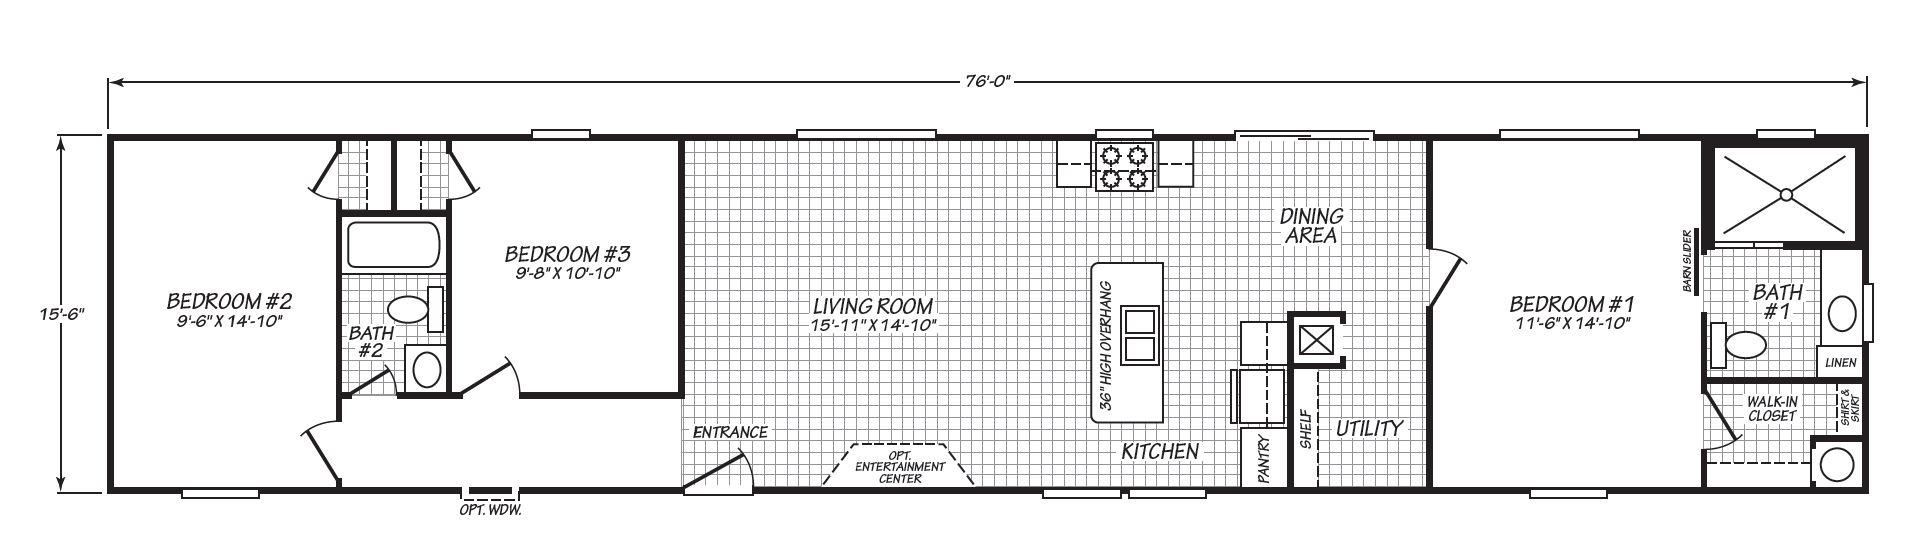 The Excursion Floorplan